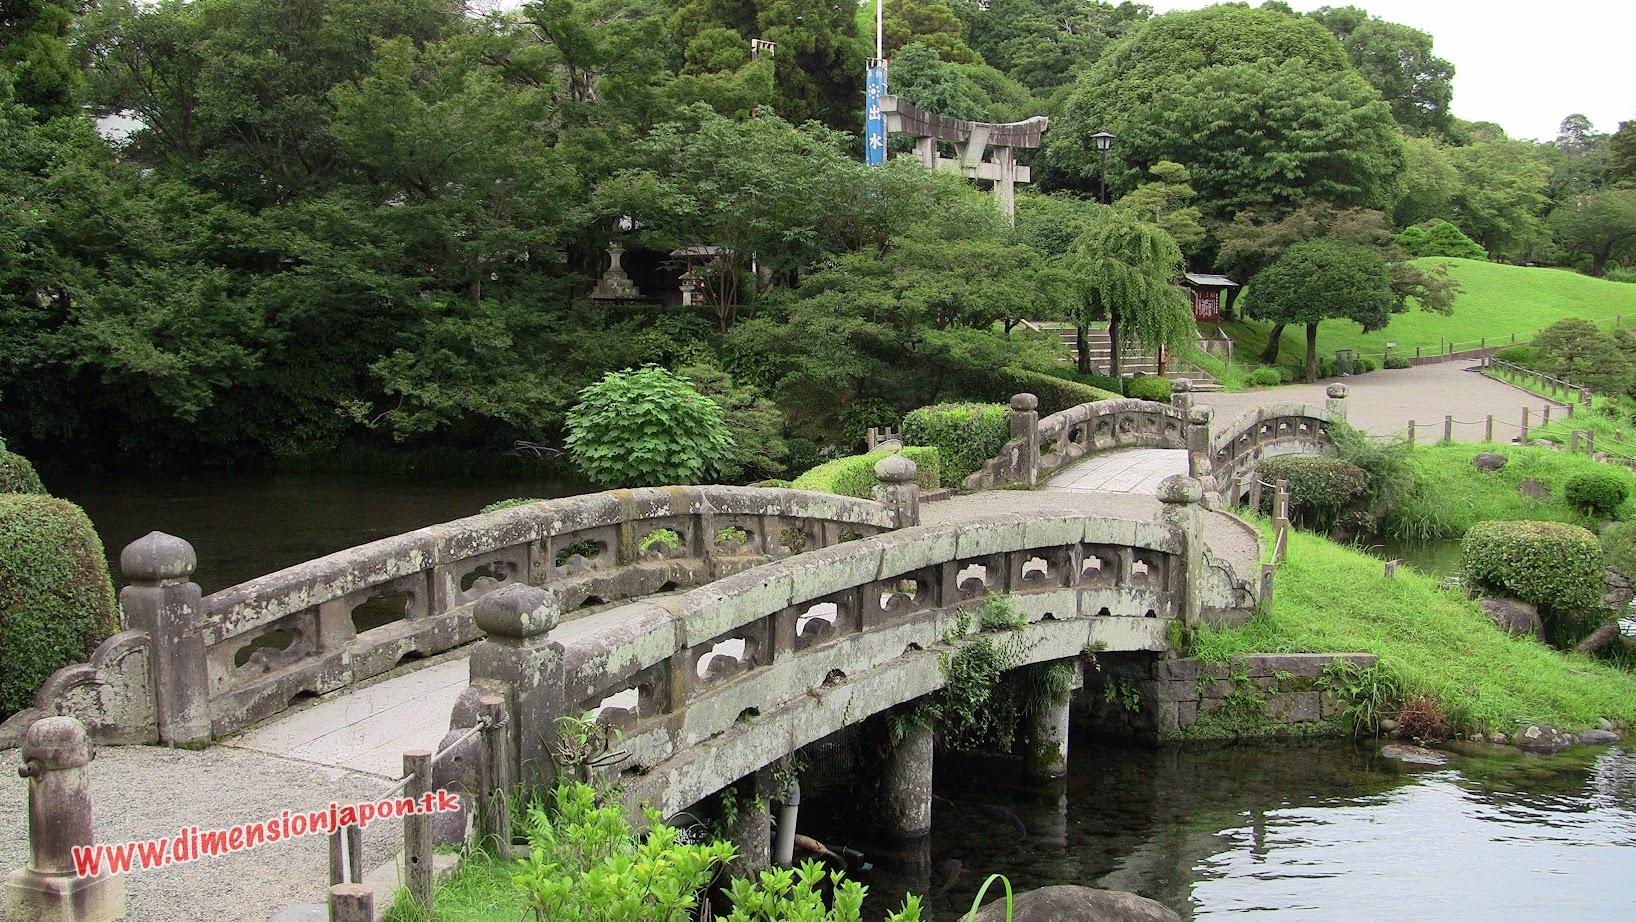 IMG_0579 Jardines Suizenji (Kumamoto) 15-07-2010